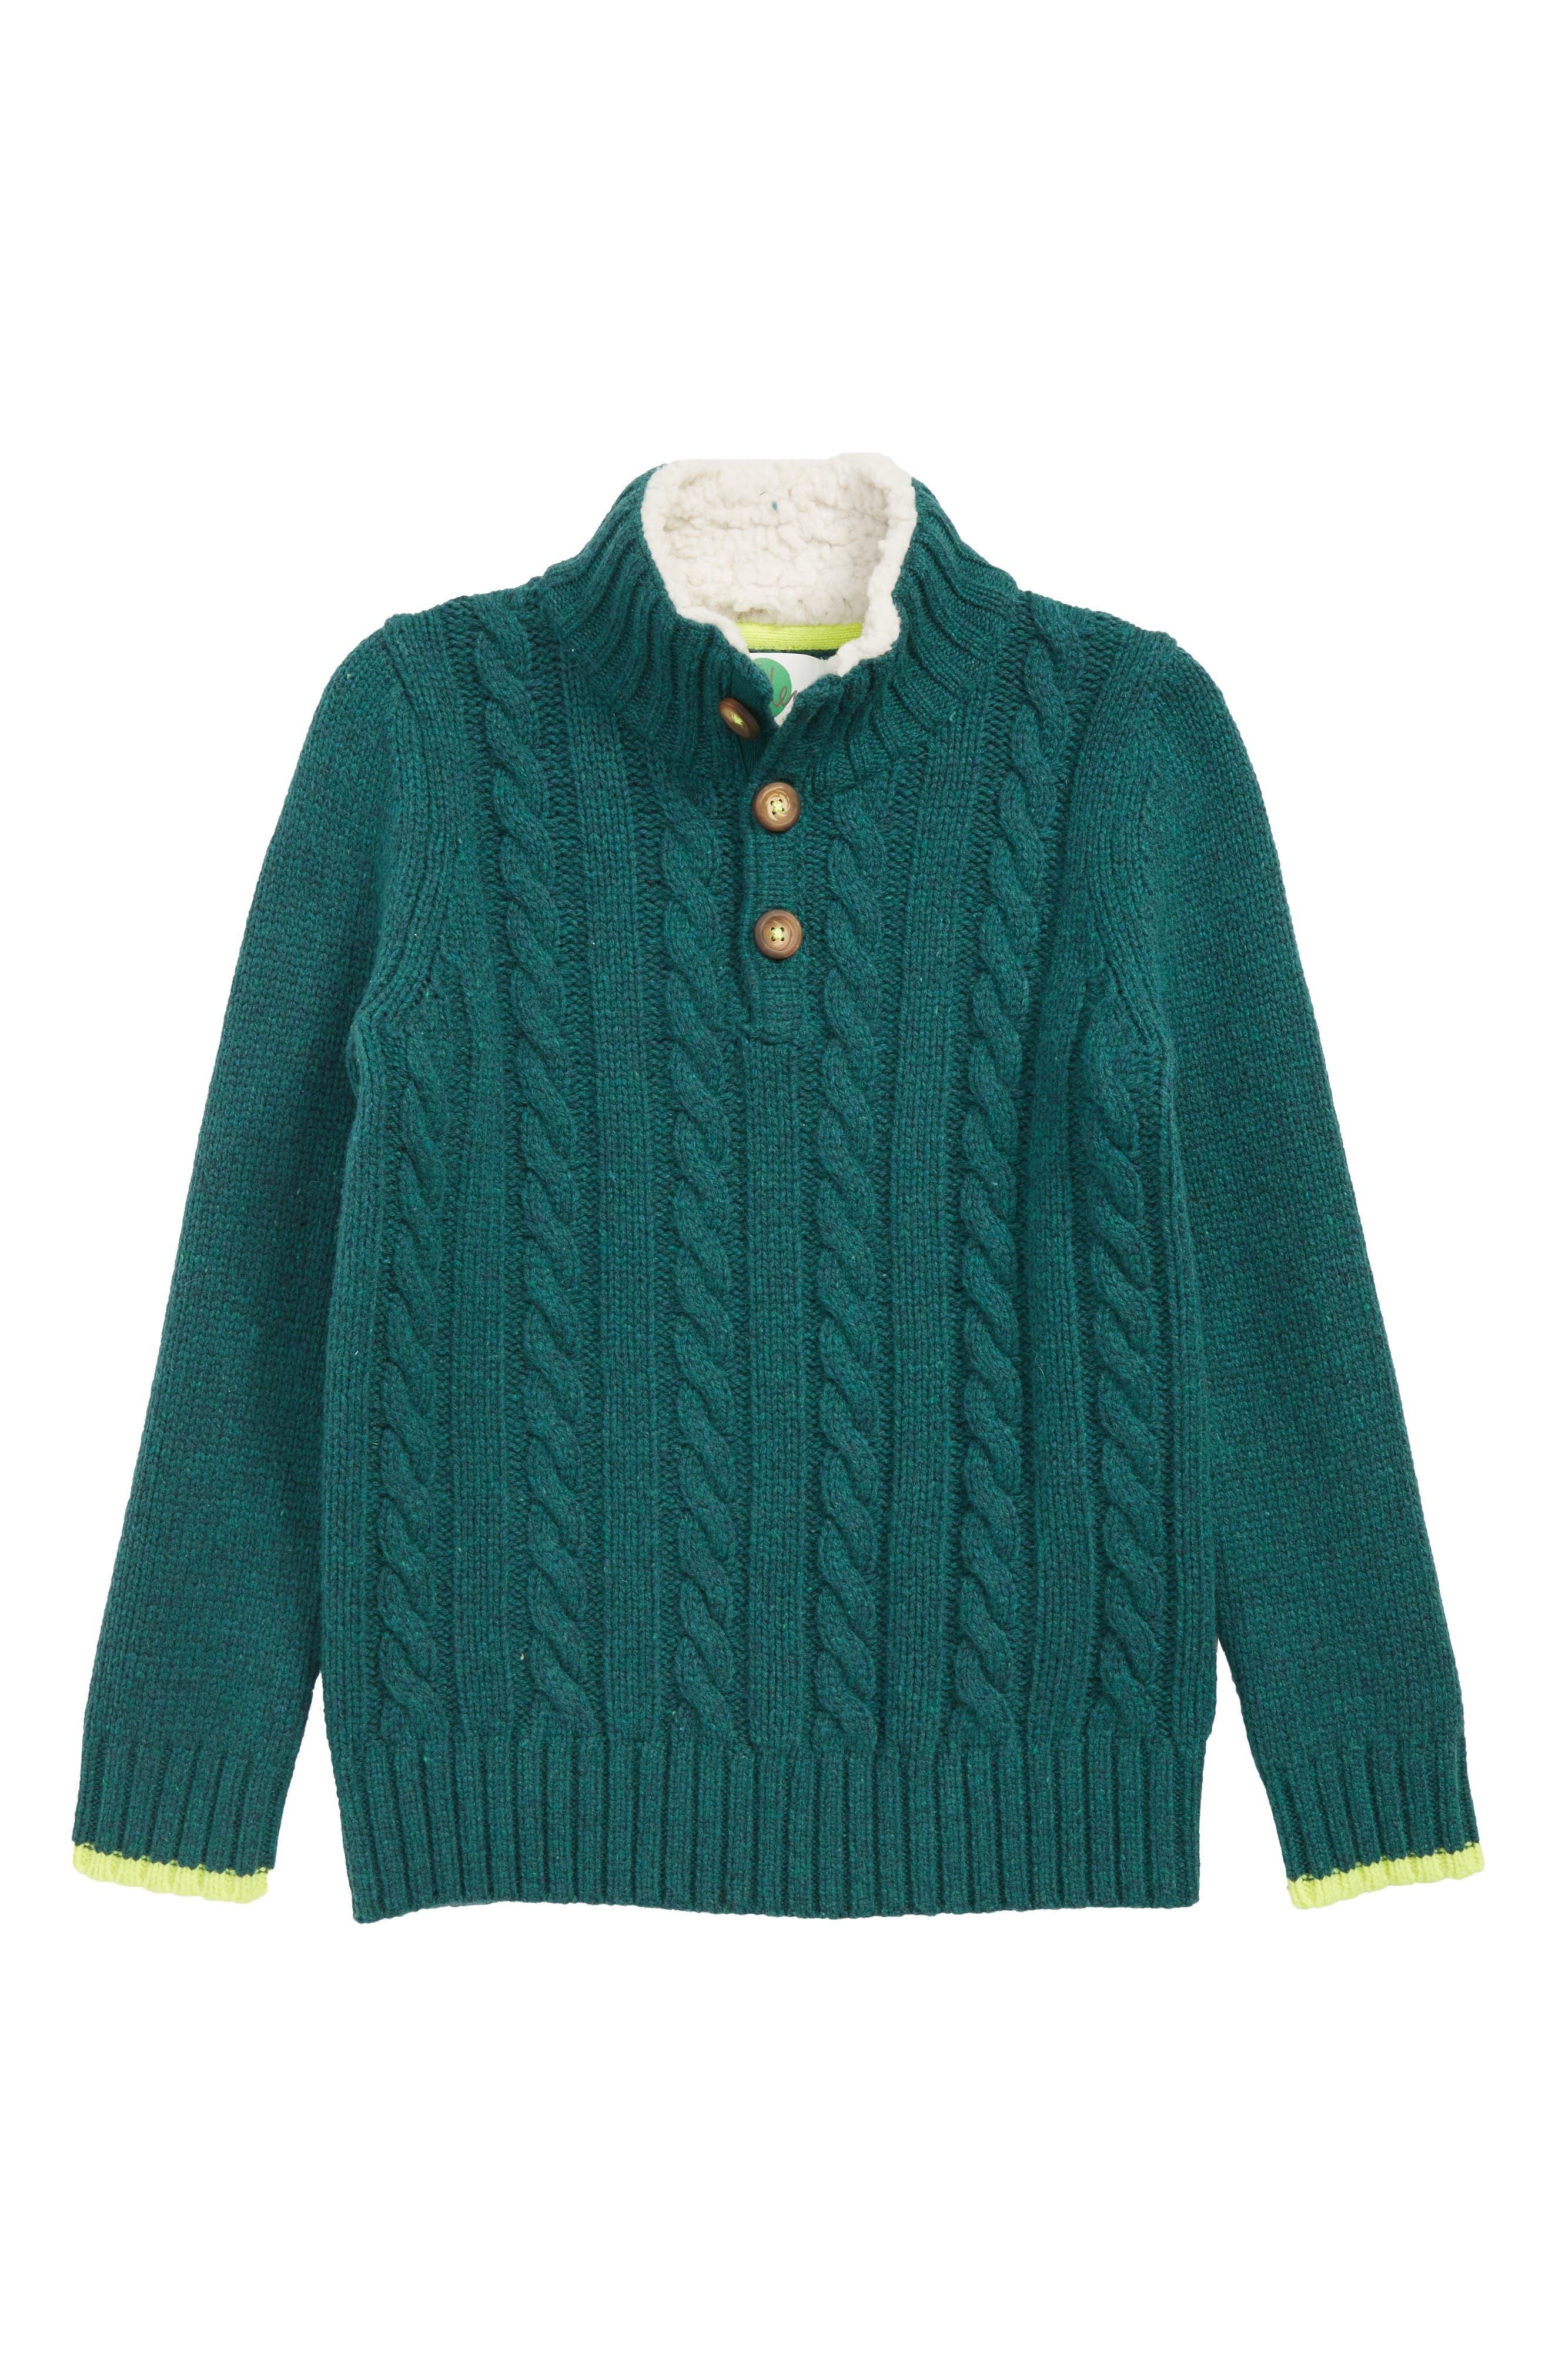 MINI BODEN,                             Chunky Knit Sweater,                             Main thumbnail 1, color,                             STORM GREEN